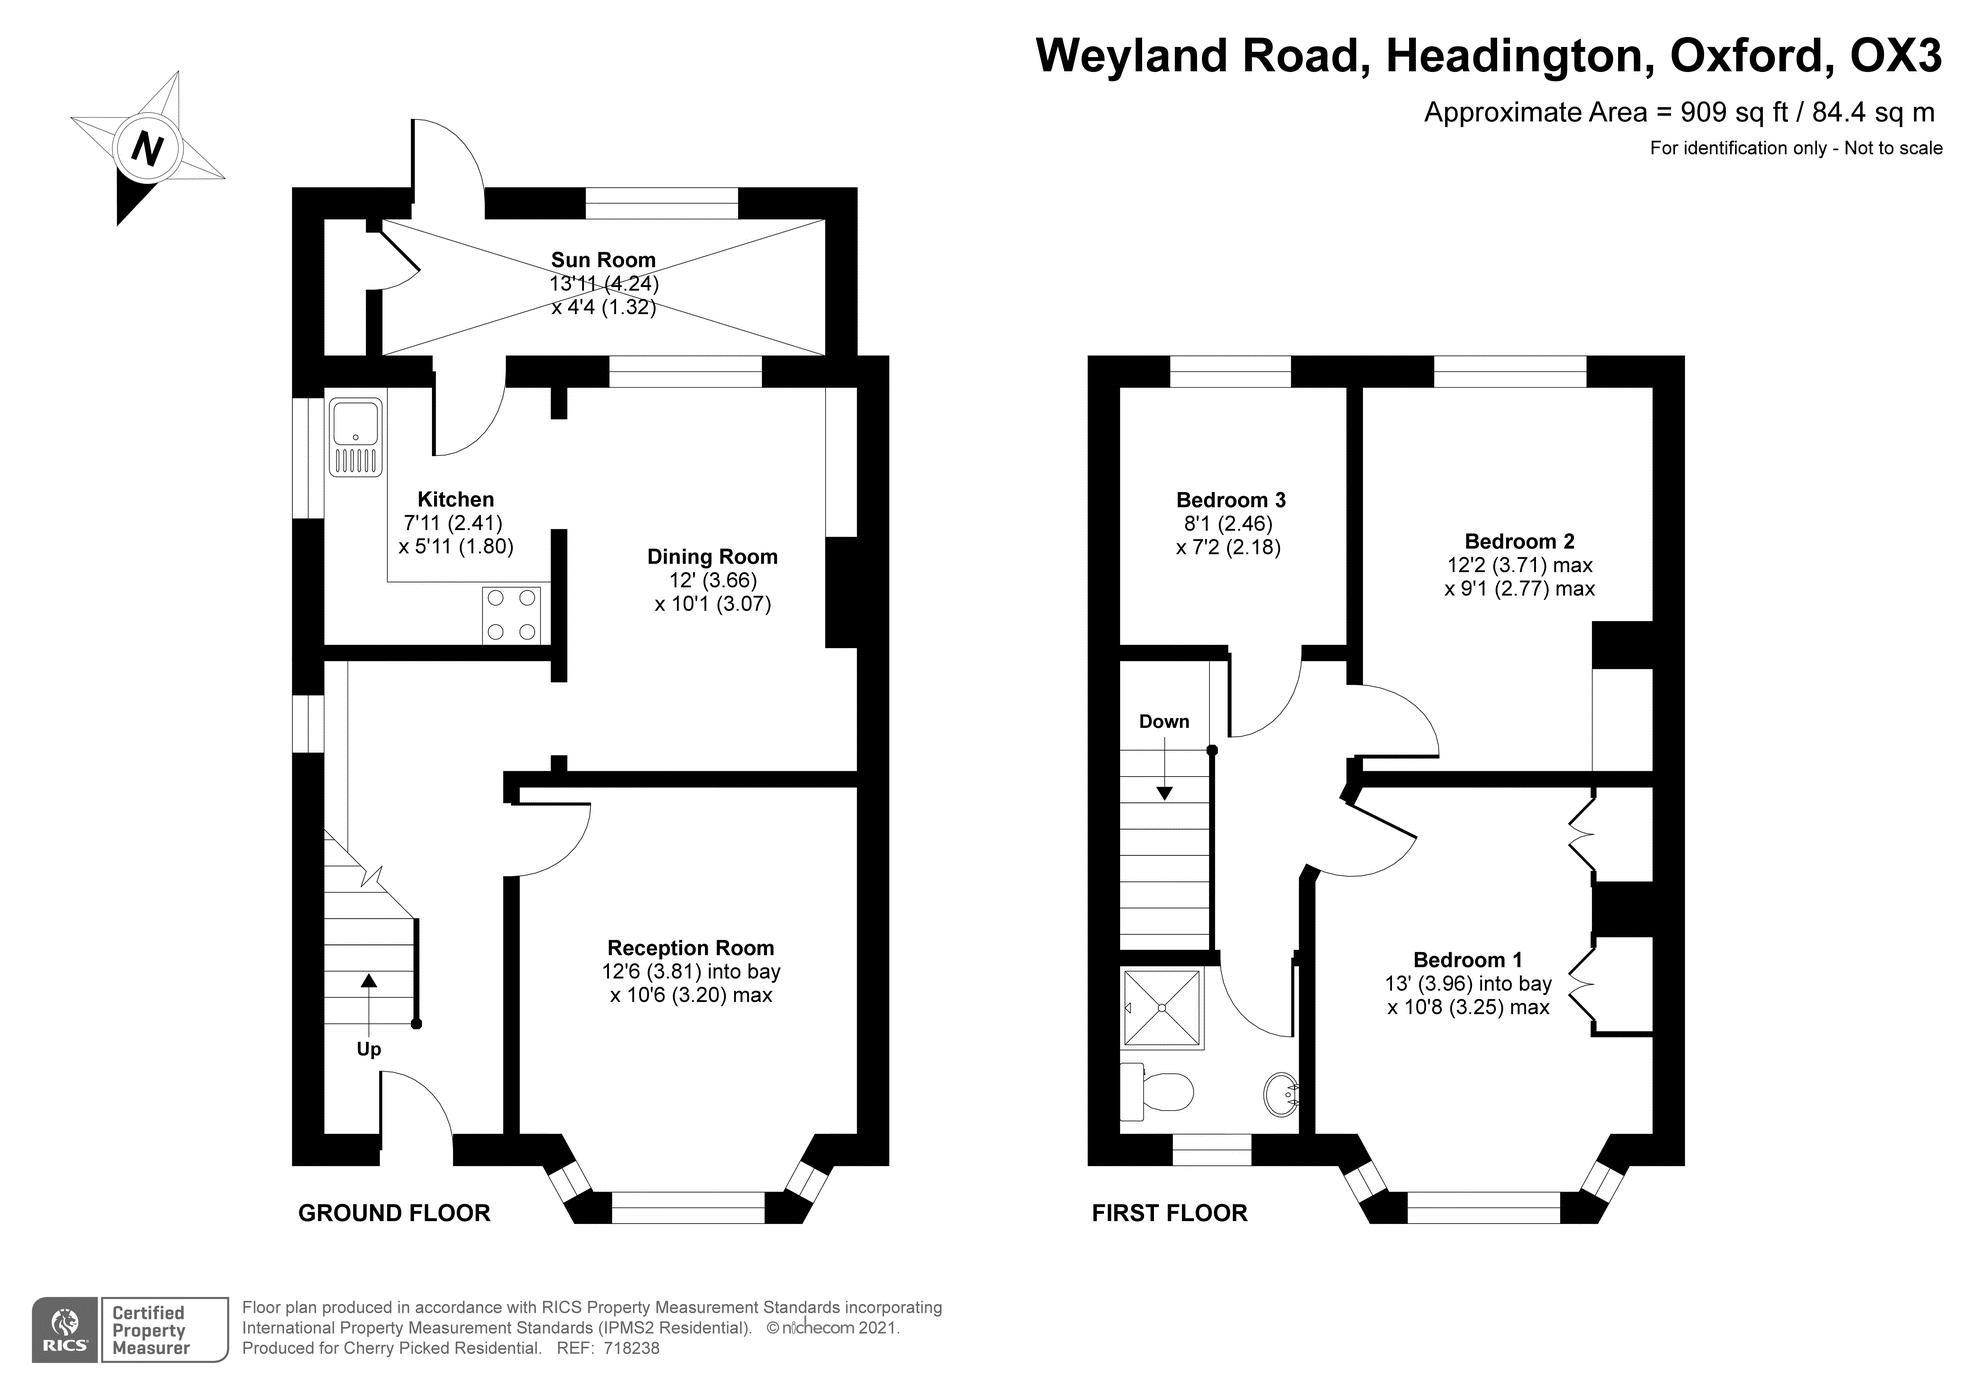 Weyland Road Headington